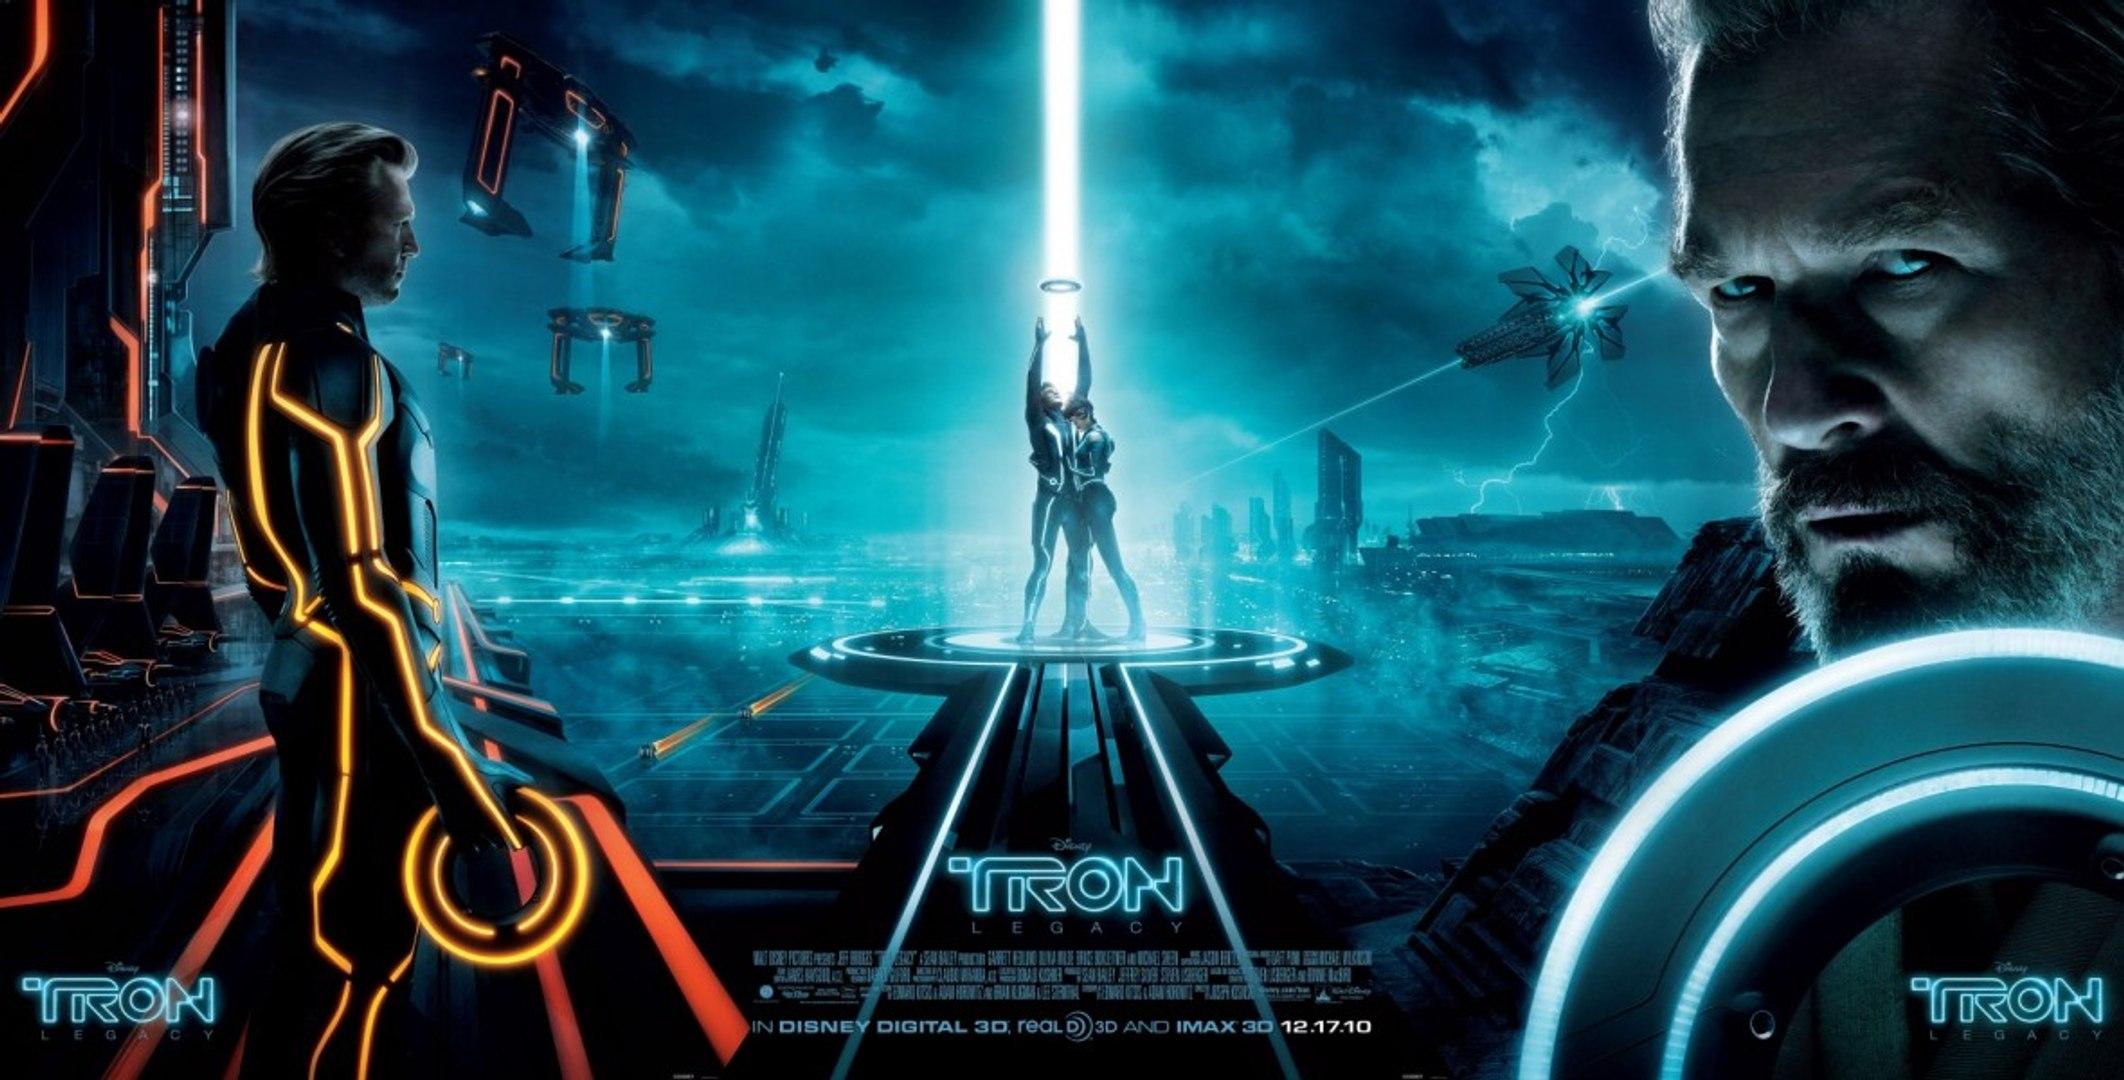 TRON L'HÉRITAGE Film